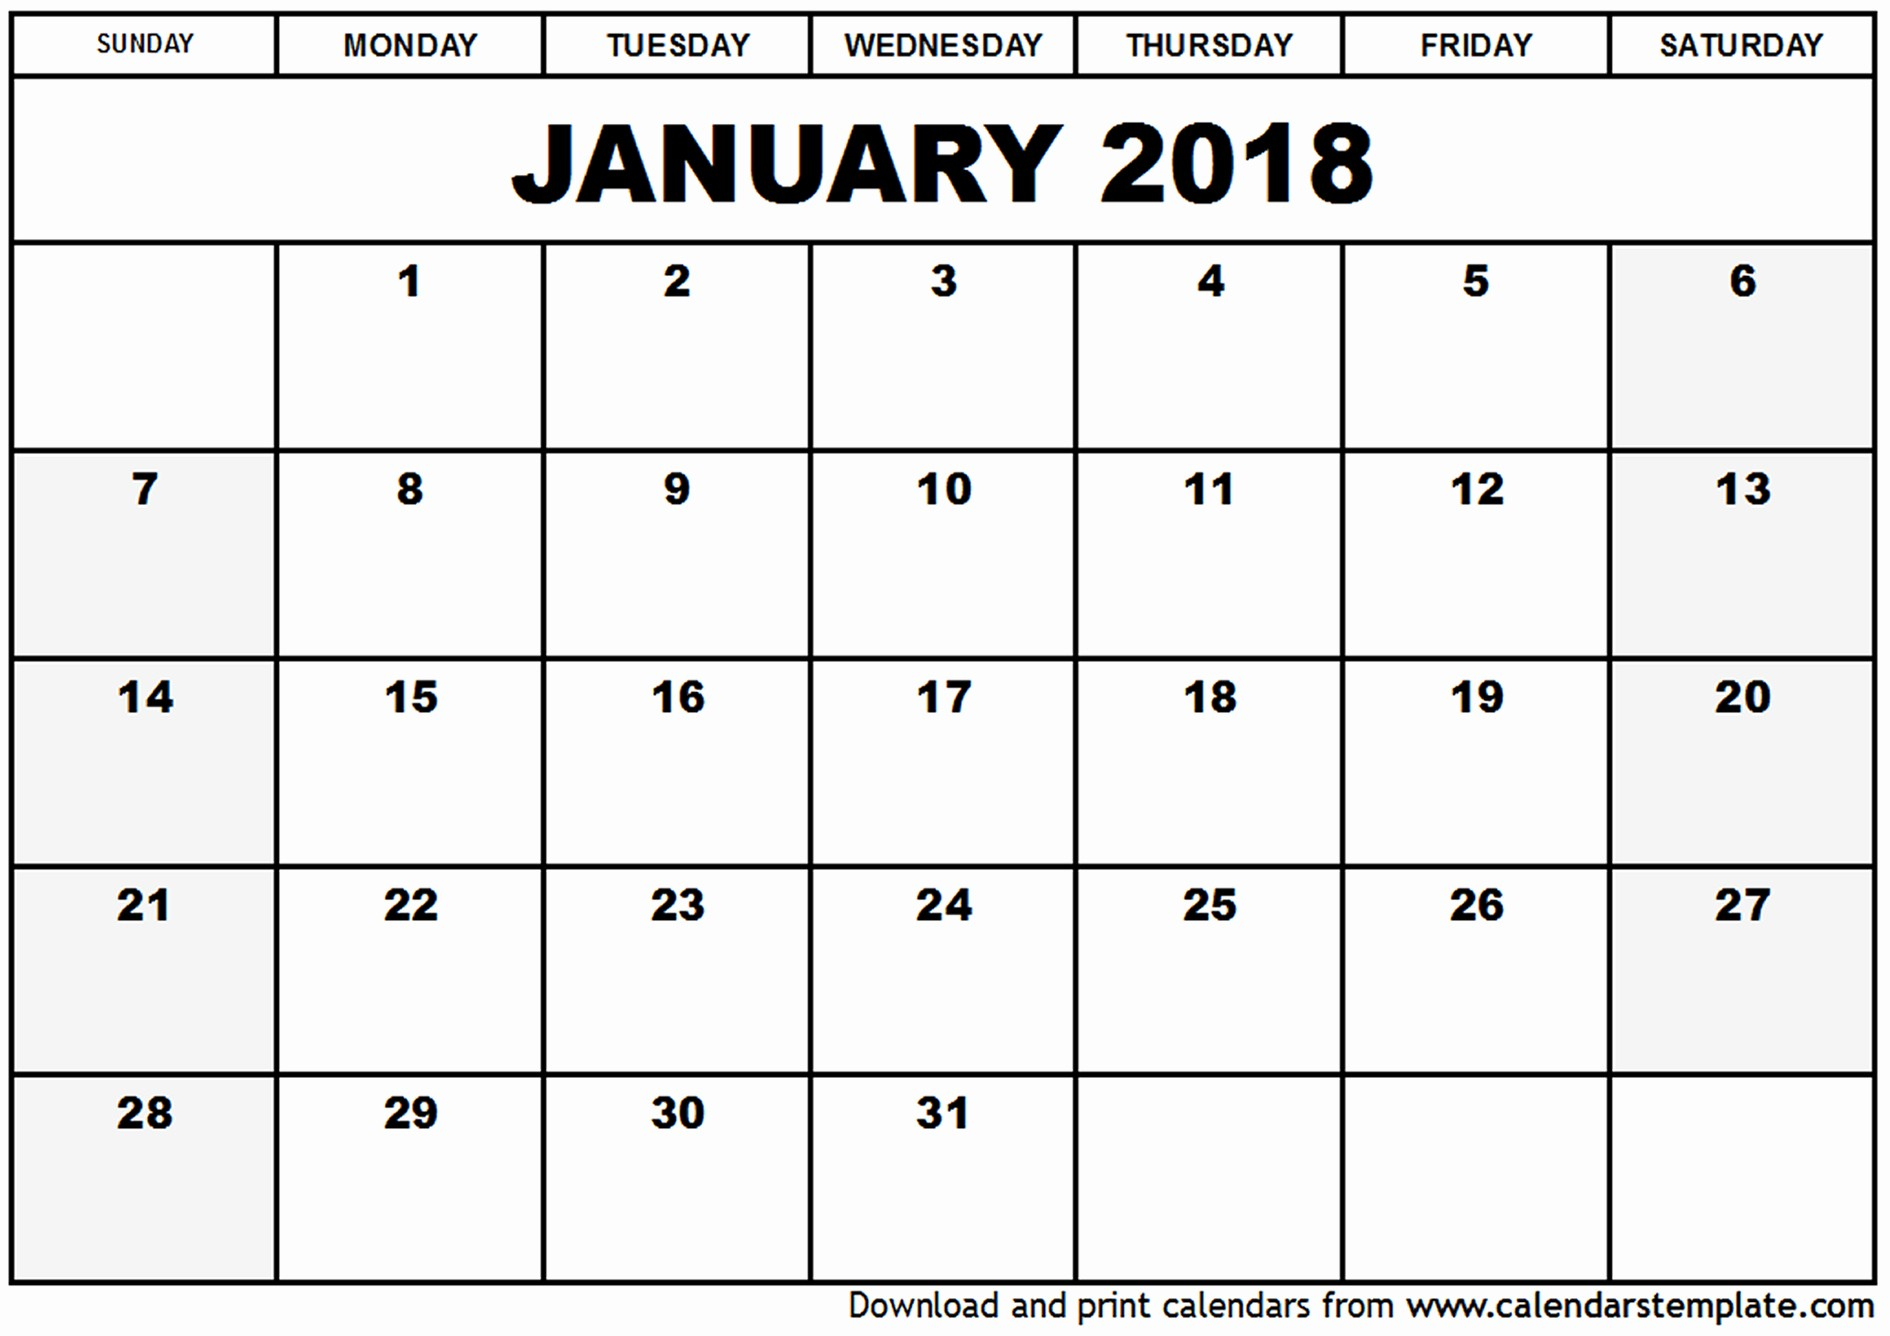 Free Printable 2018 Calendar Templates Inspirational January 2018 Calendar Template